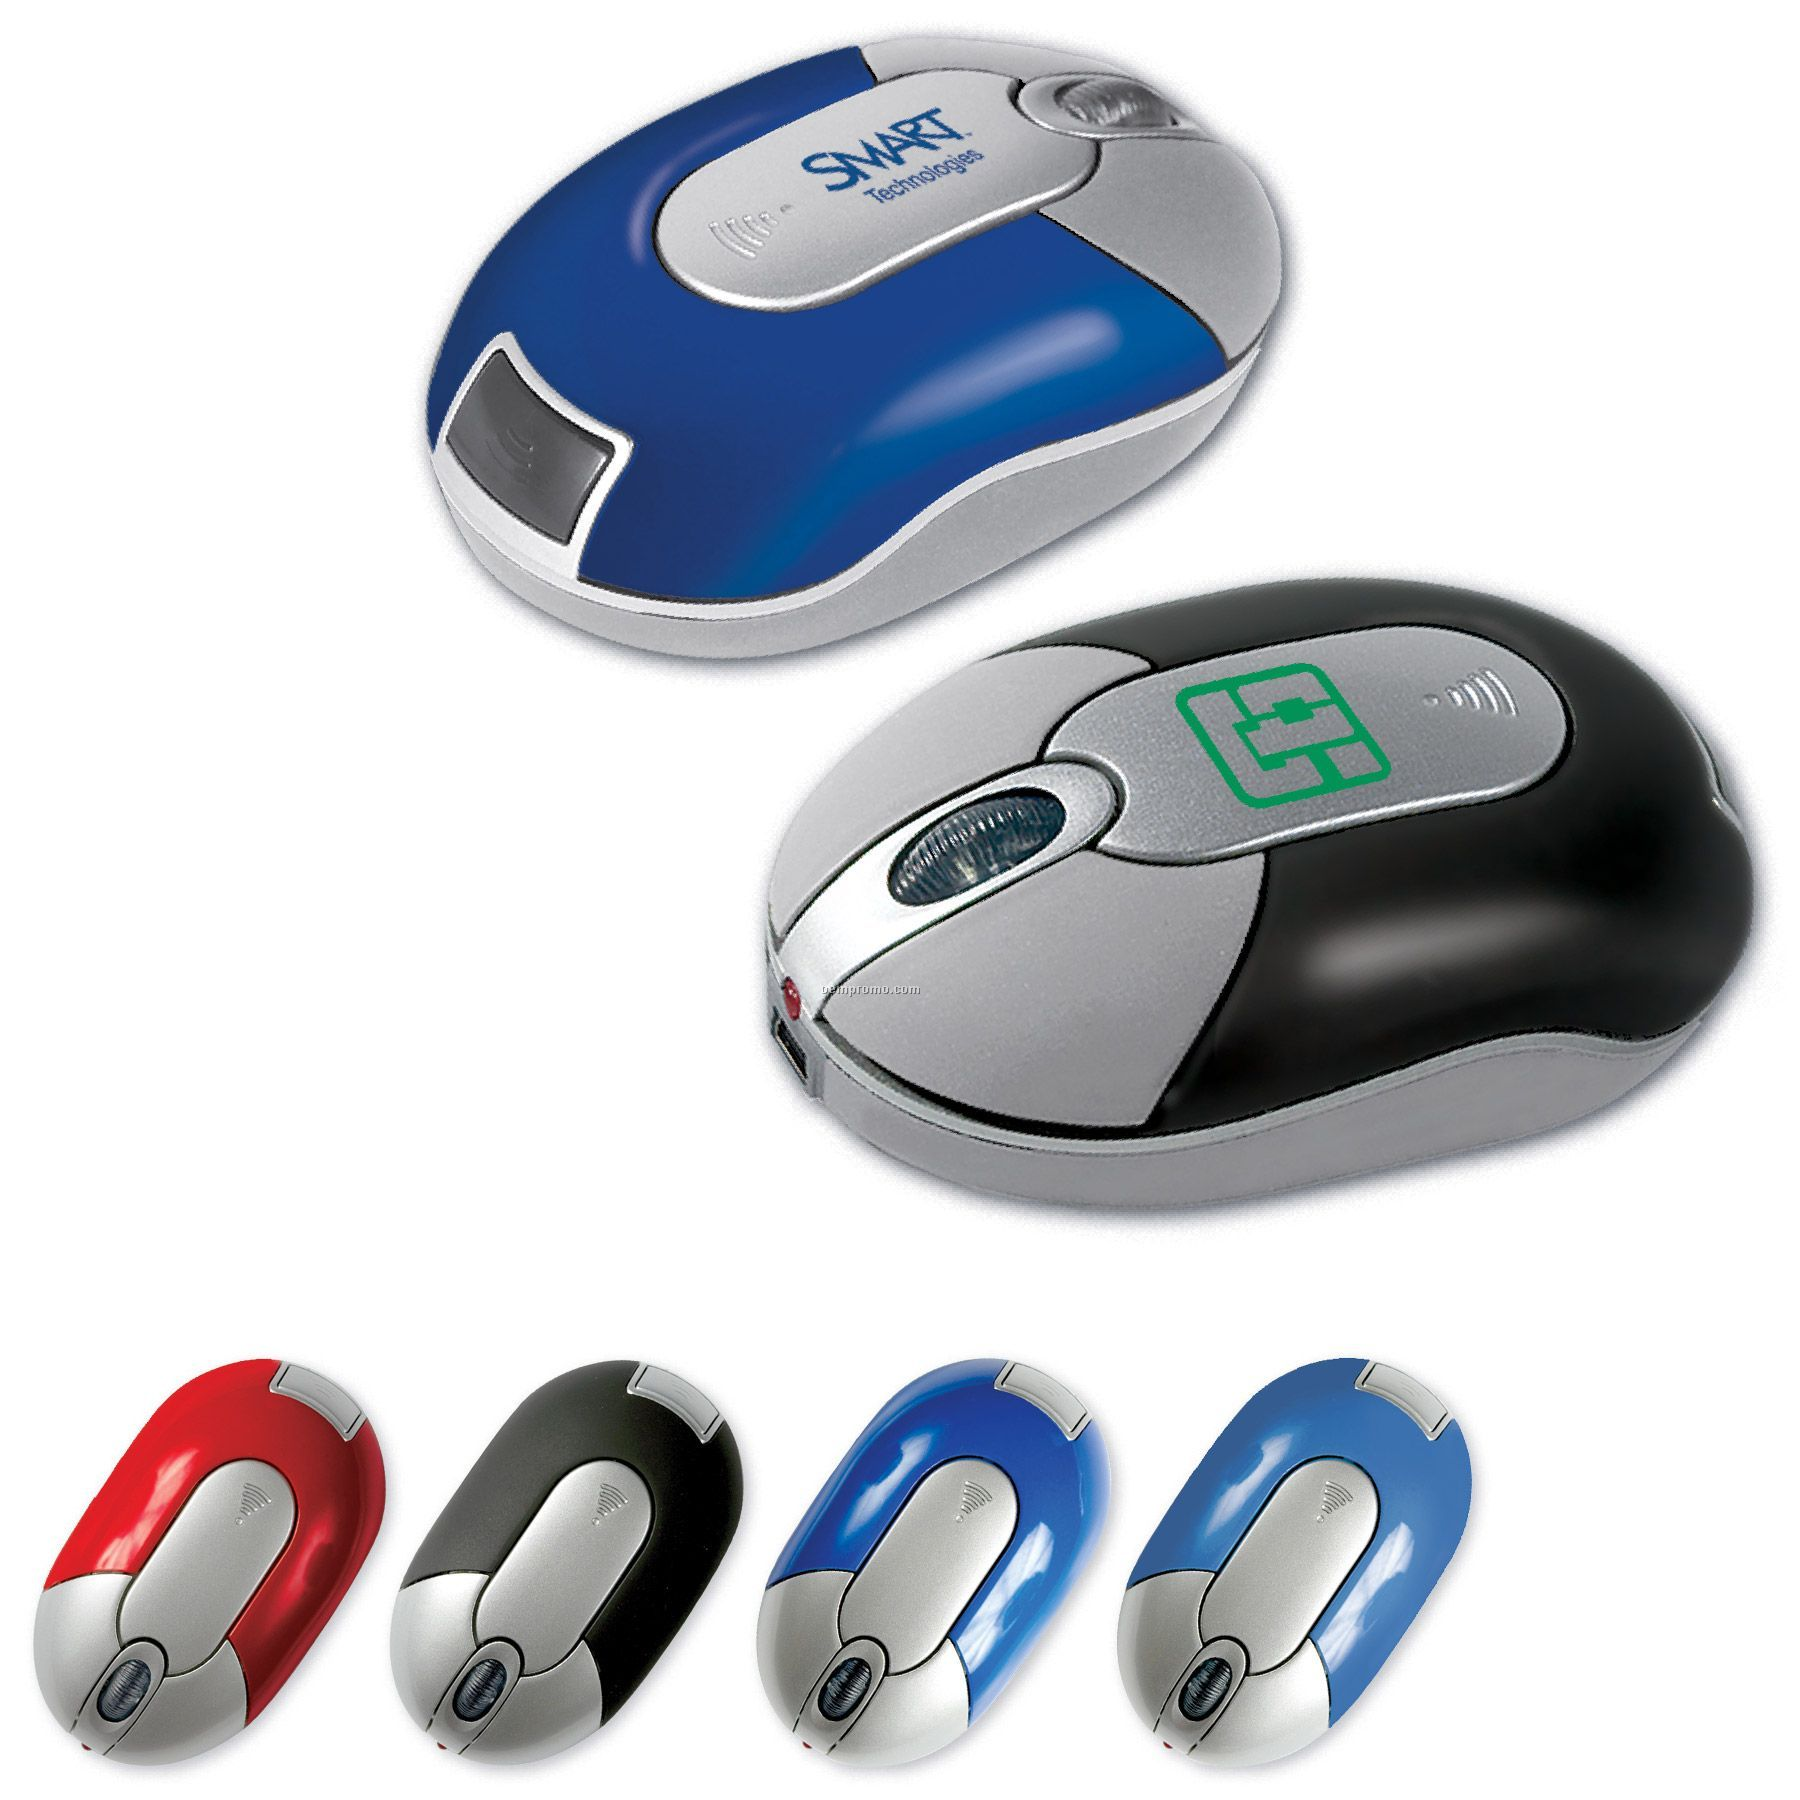 Power Mouse M71